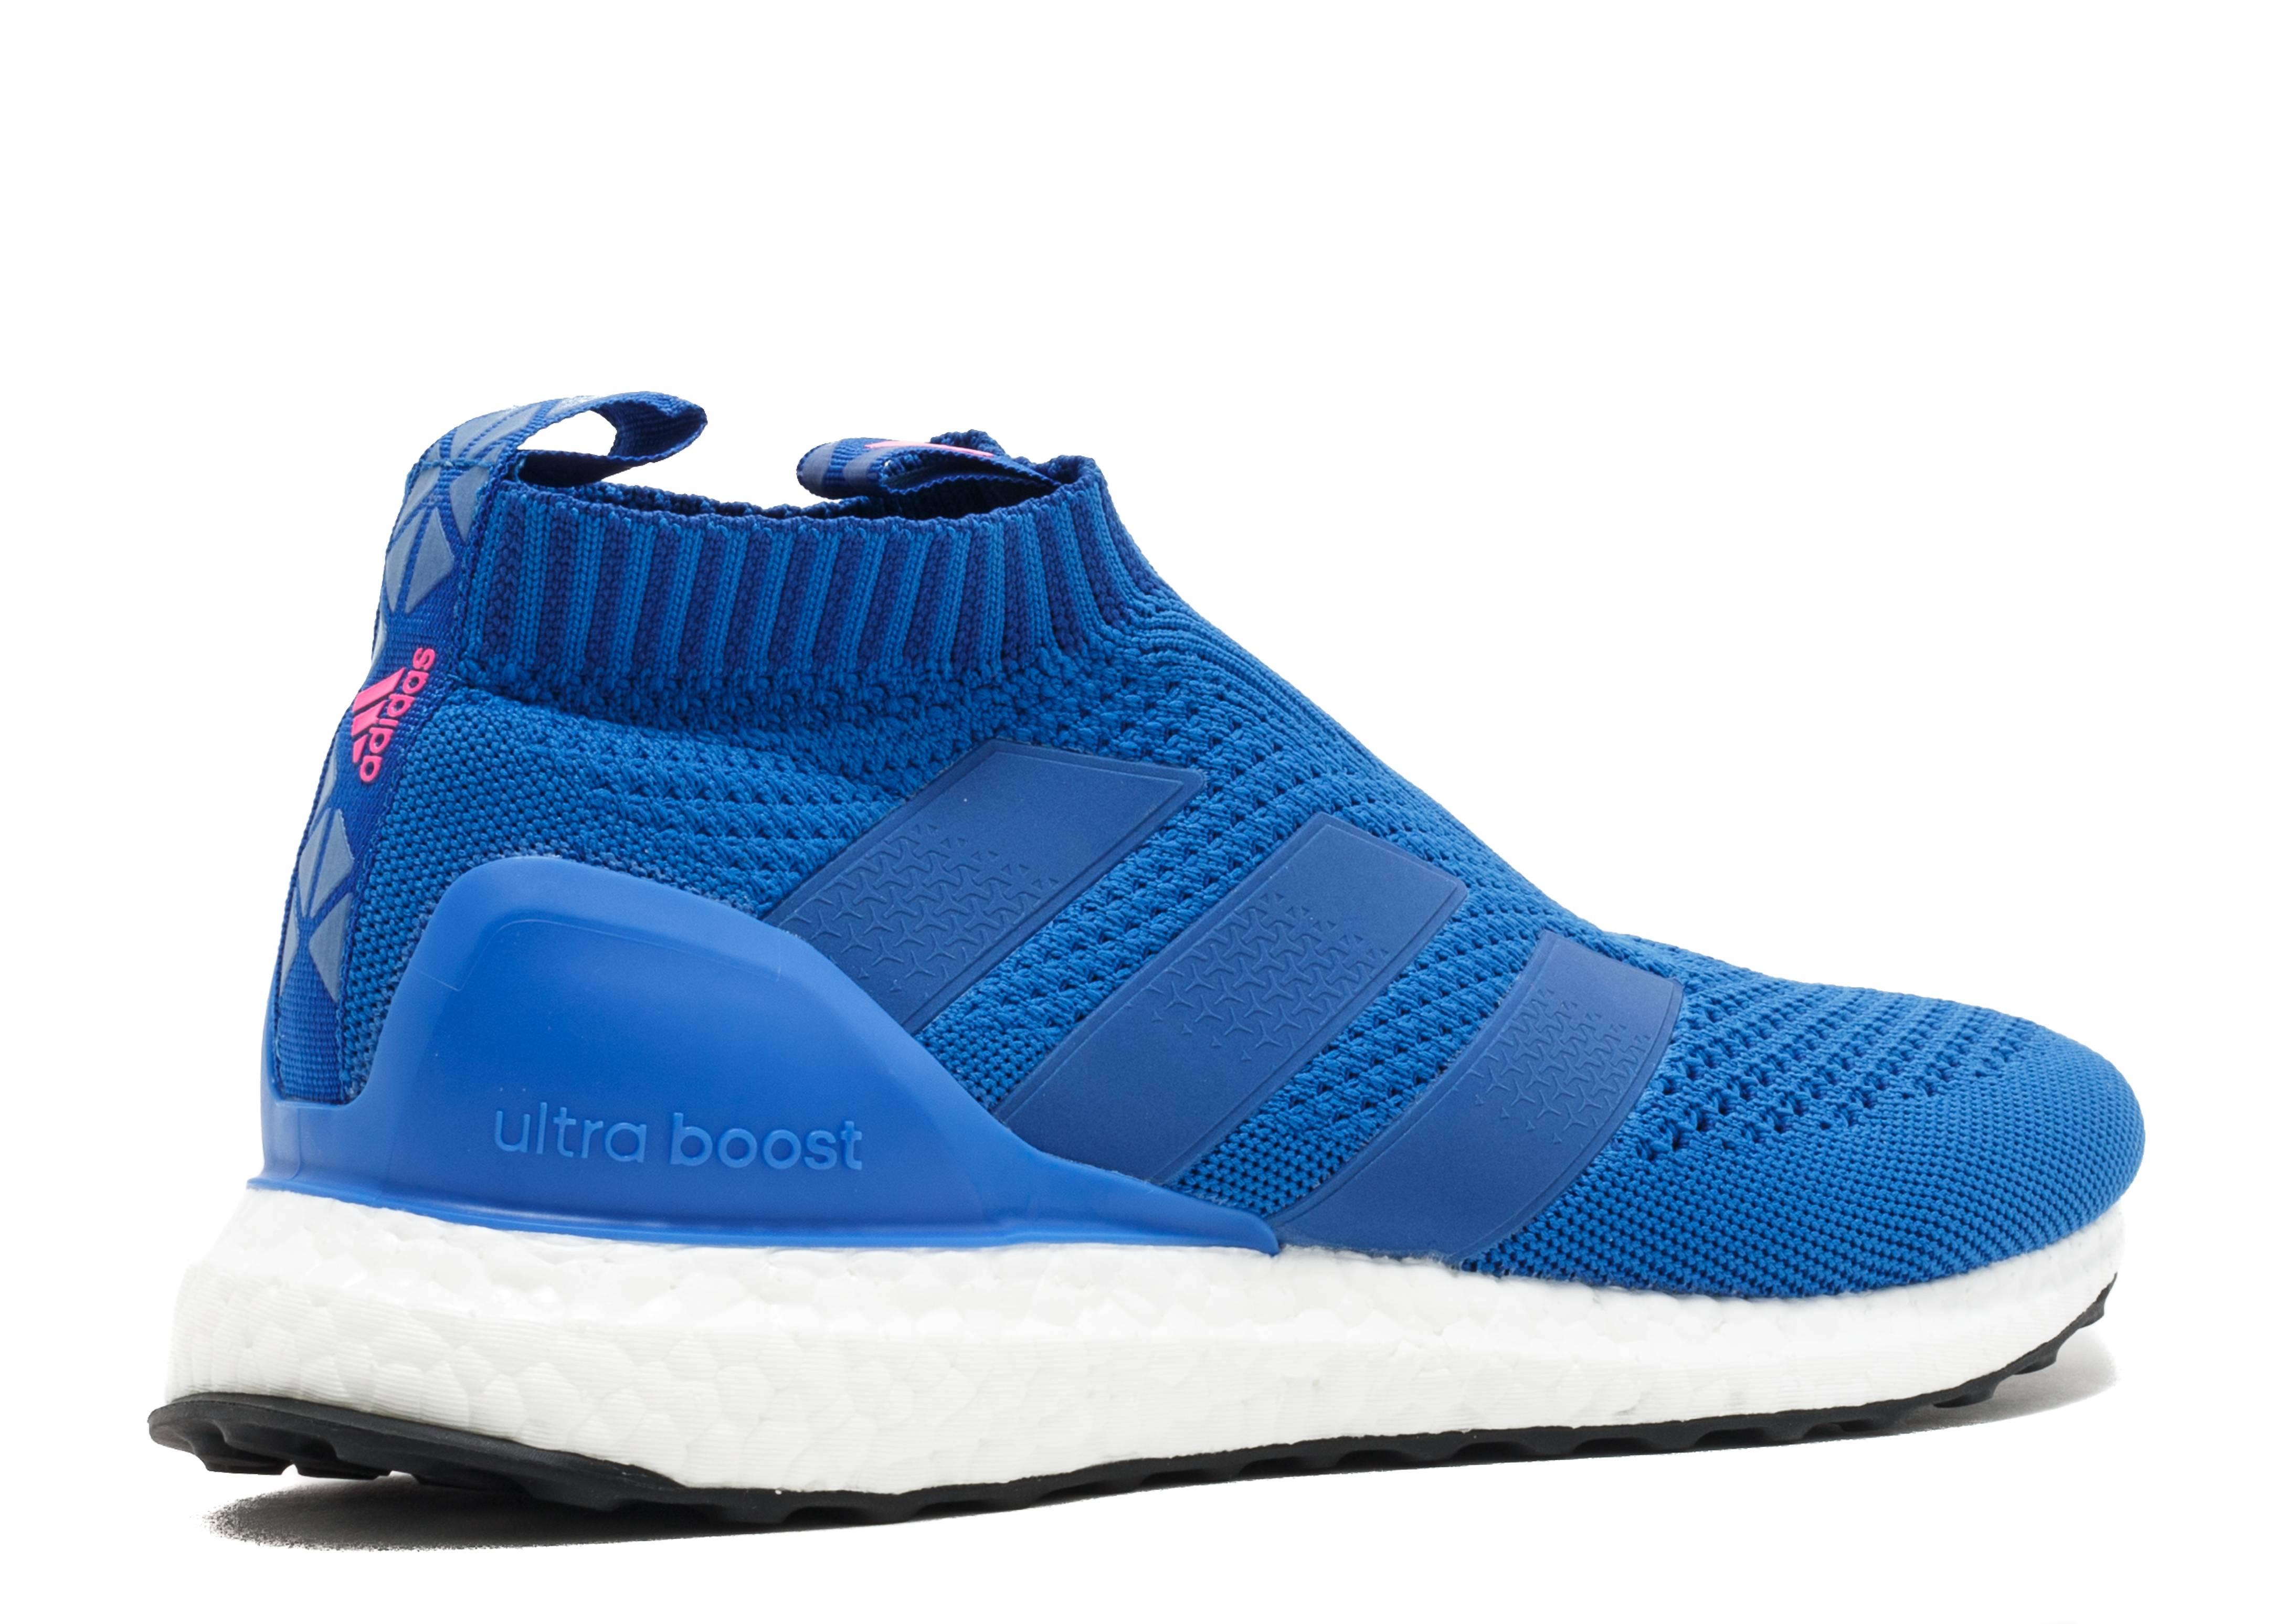 hot sale online 25823 50a4f Ace 16+ Purecontrol Ultraboost - Adidas - by9090 - blueblueshopin   Flight Club